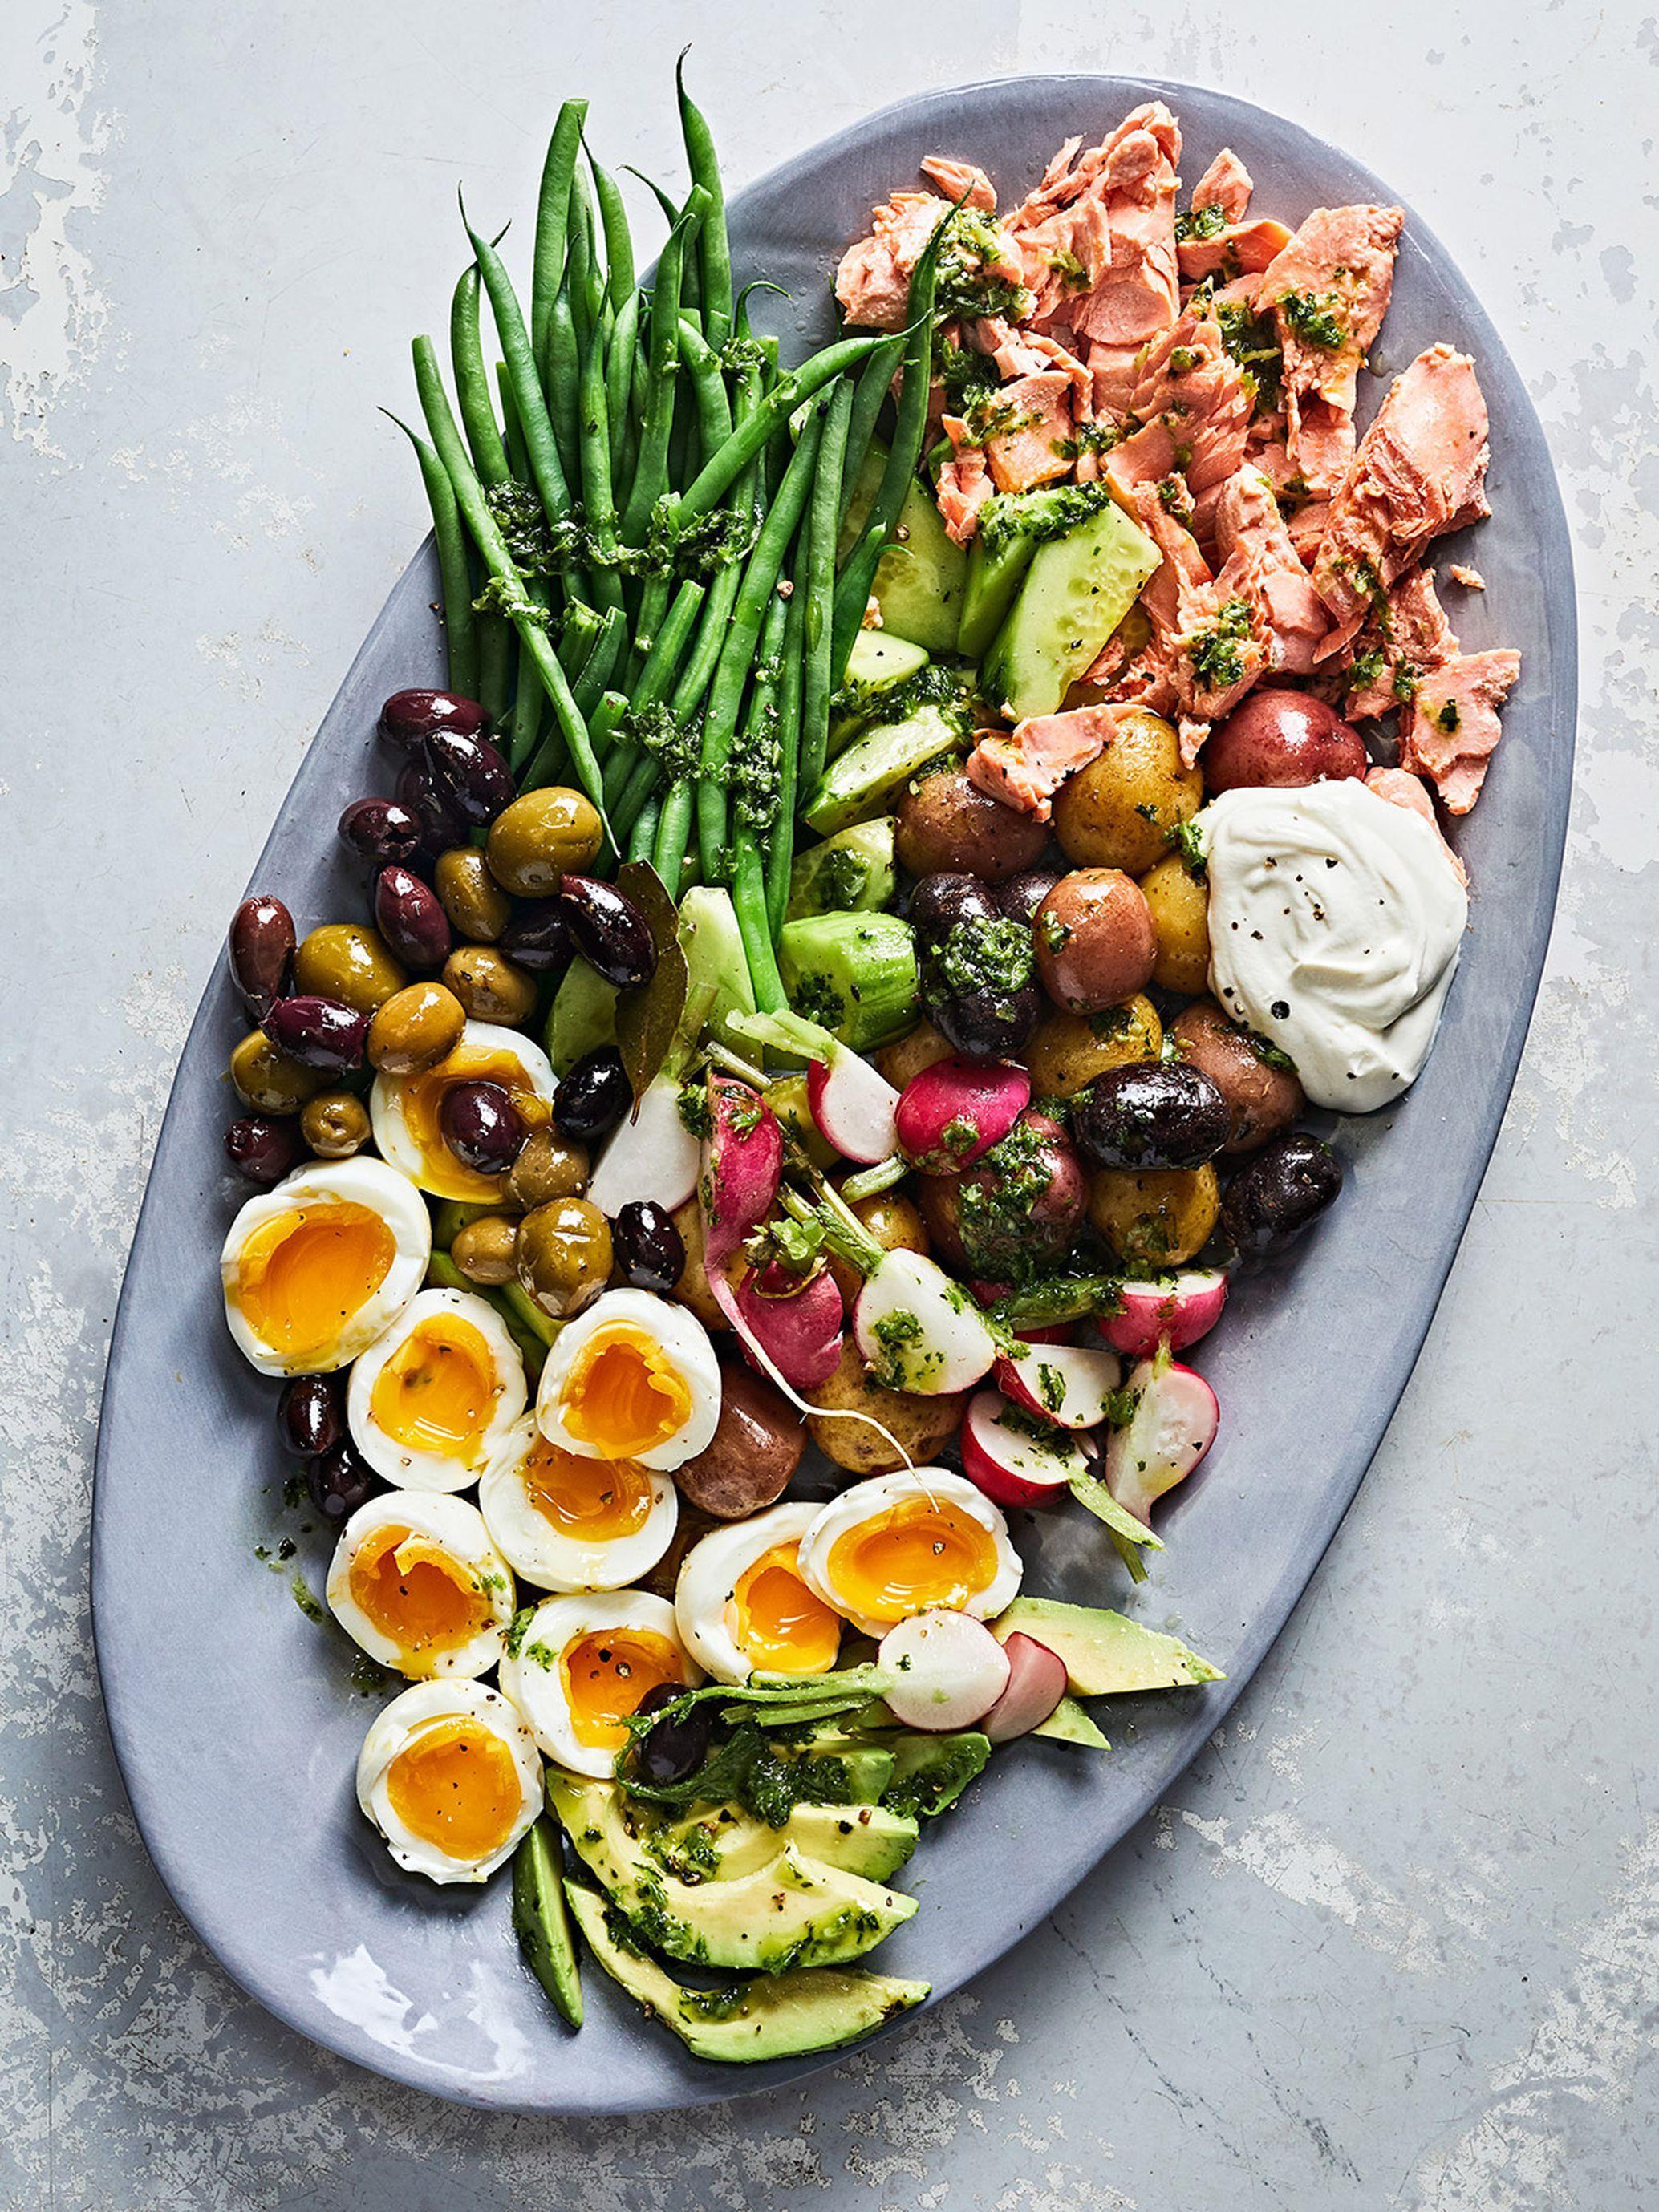 Salmon Nicoise Salad With Garlic Herb Dressing Healthy Recipes Salmon Nicoise Salad Recipes